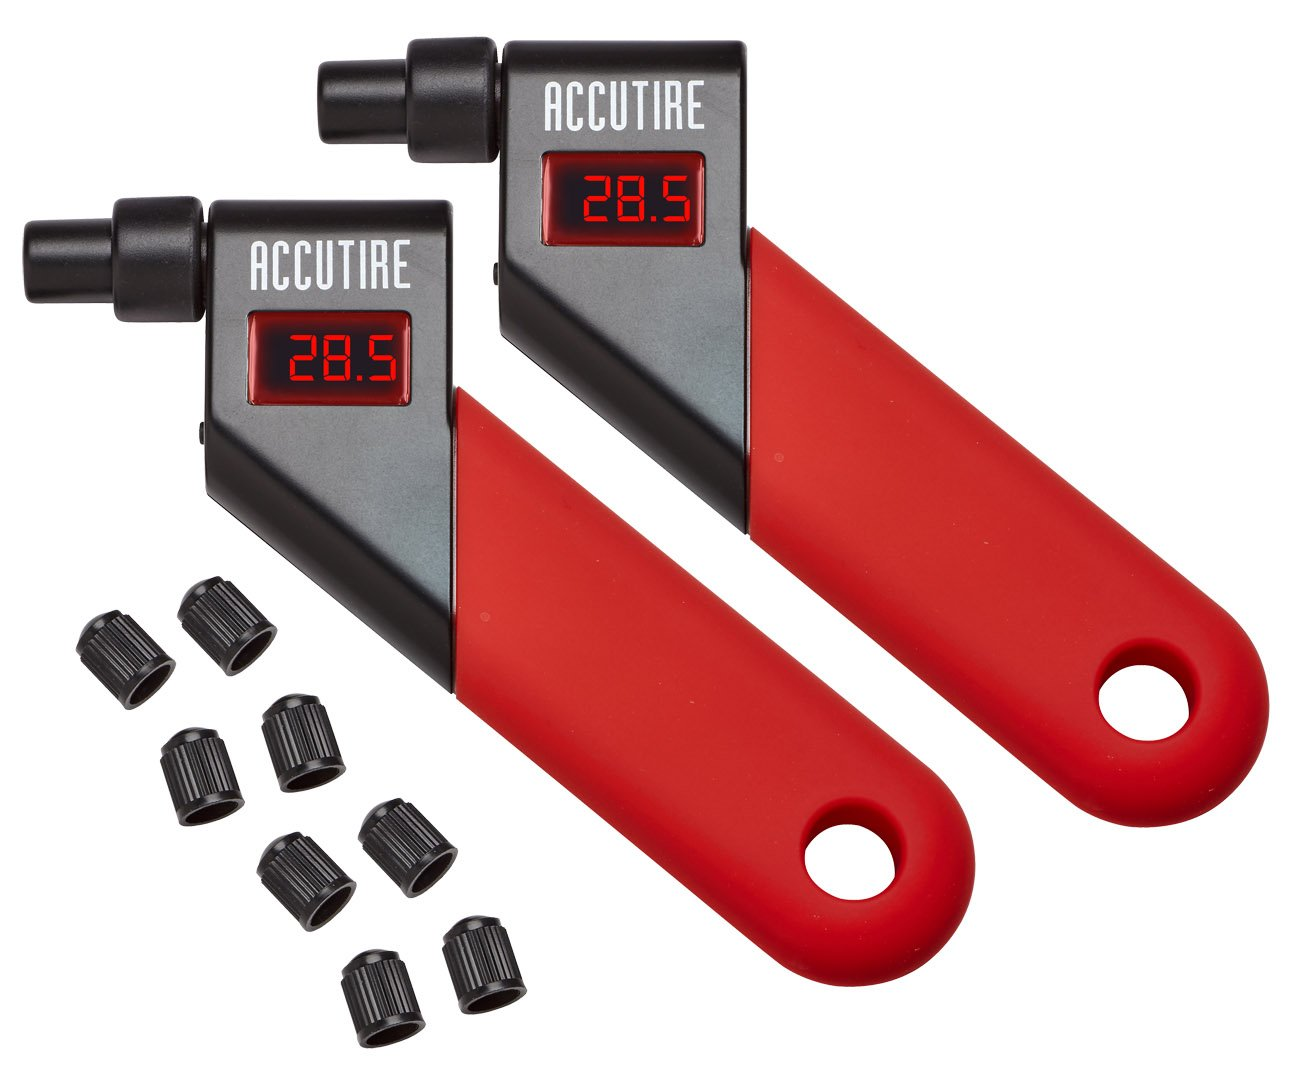 Accutire MS-4021R Digital Tire Pressure Gauge with 8 Valve Caps (2 Pack)